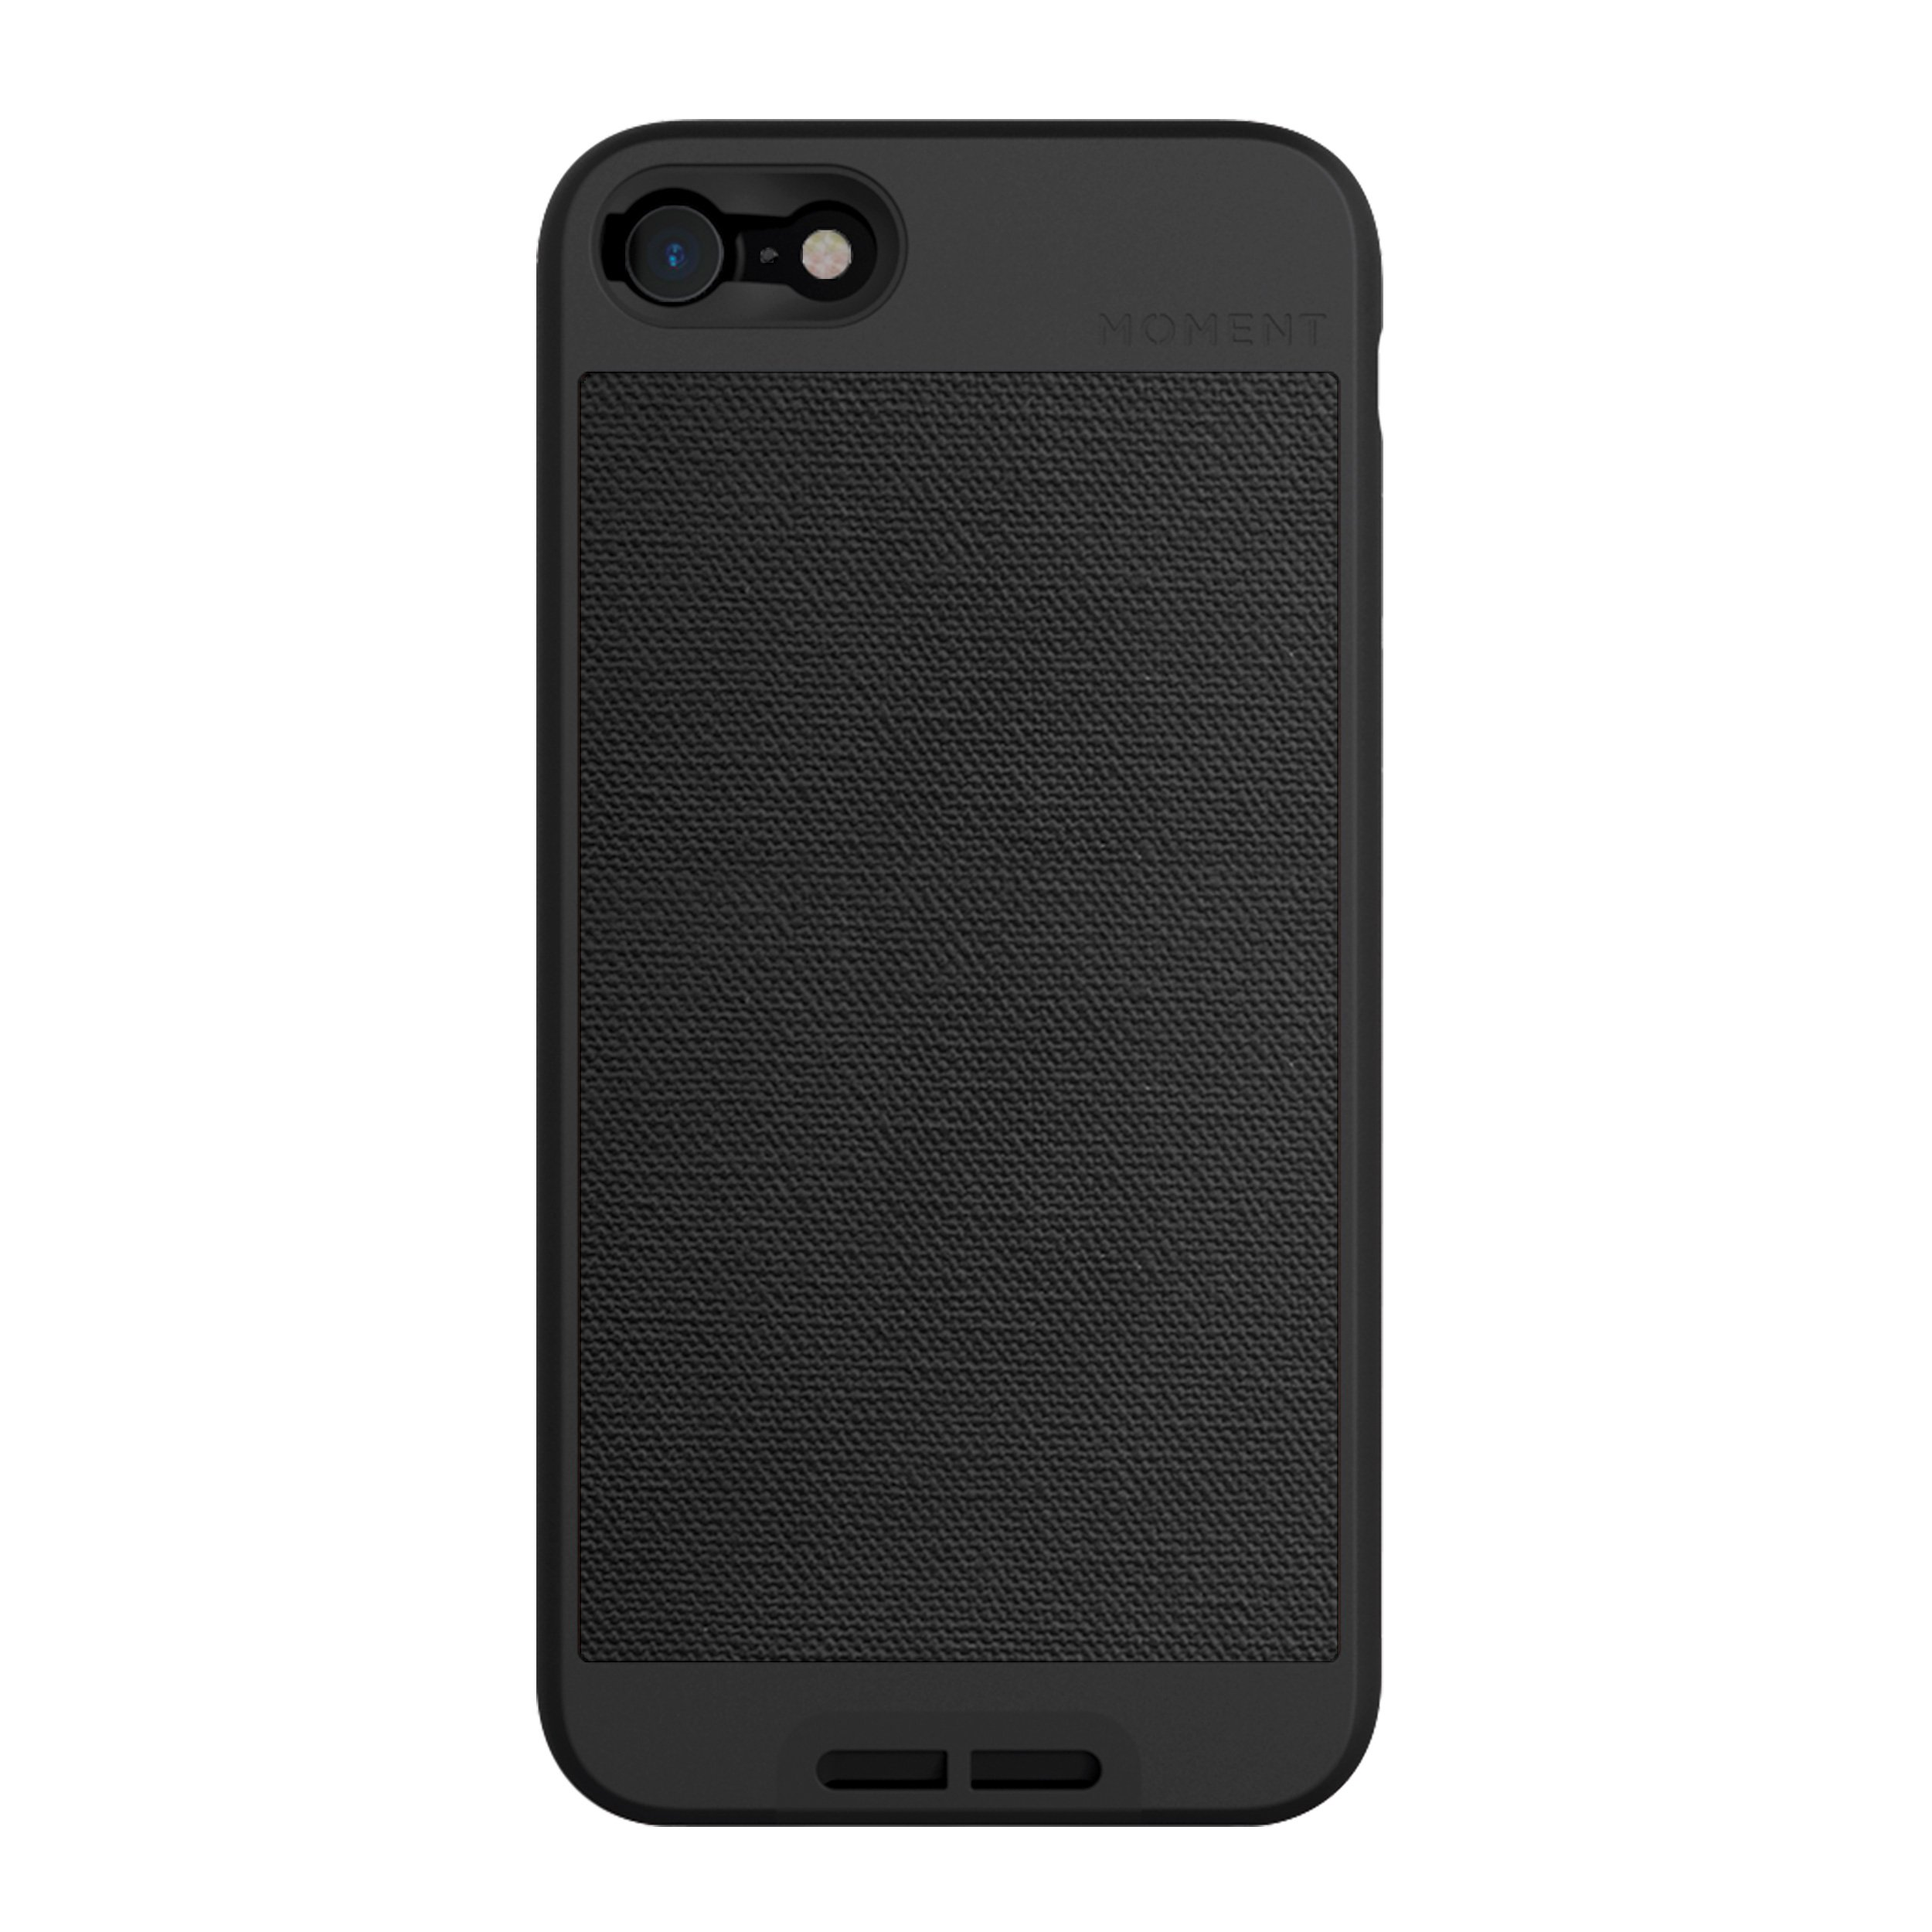 ویکالا · خرید  اصل اورجینال · خرید از آمازون · iPhone 7 / iPhone 8 Case || Moment Photo Case in Black Canvas - Thin, Protective, Wrist Strap Friendly case for Camera Lovers. wekala · ویکالا